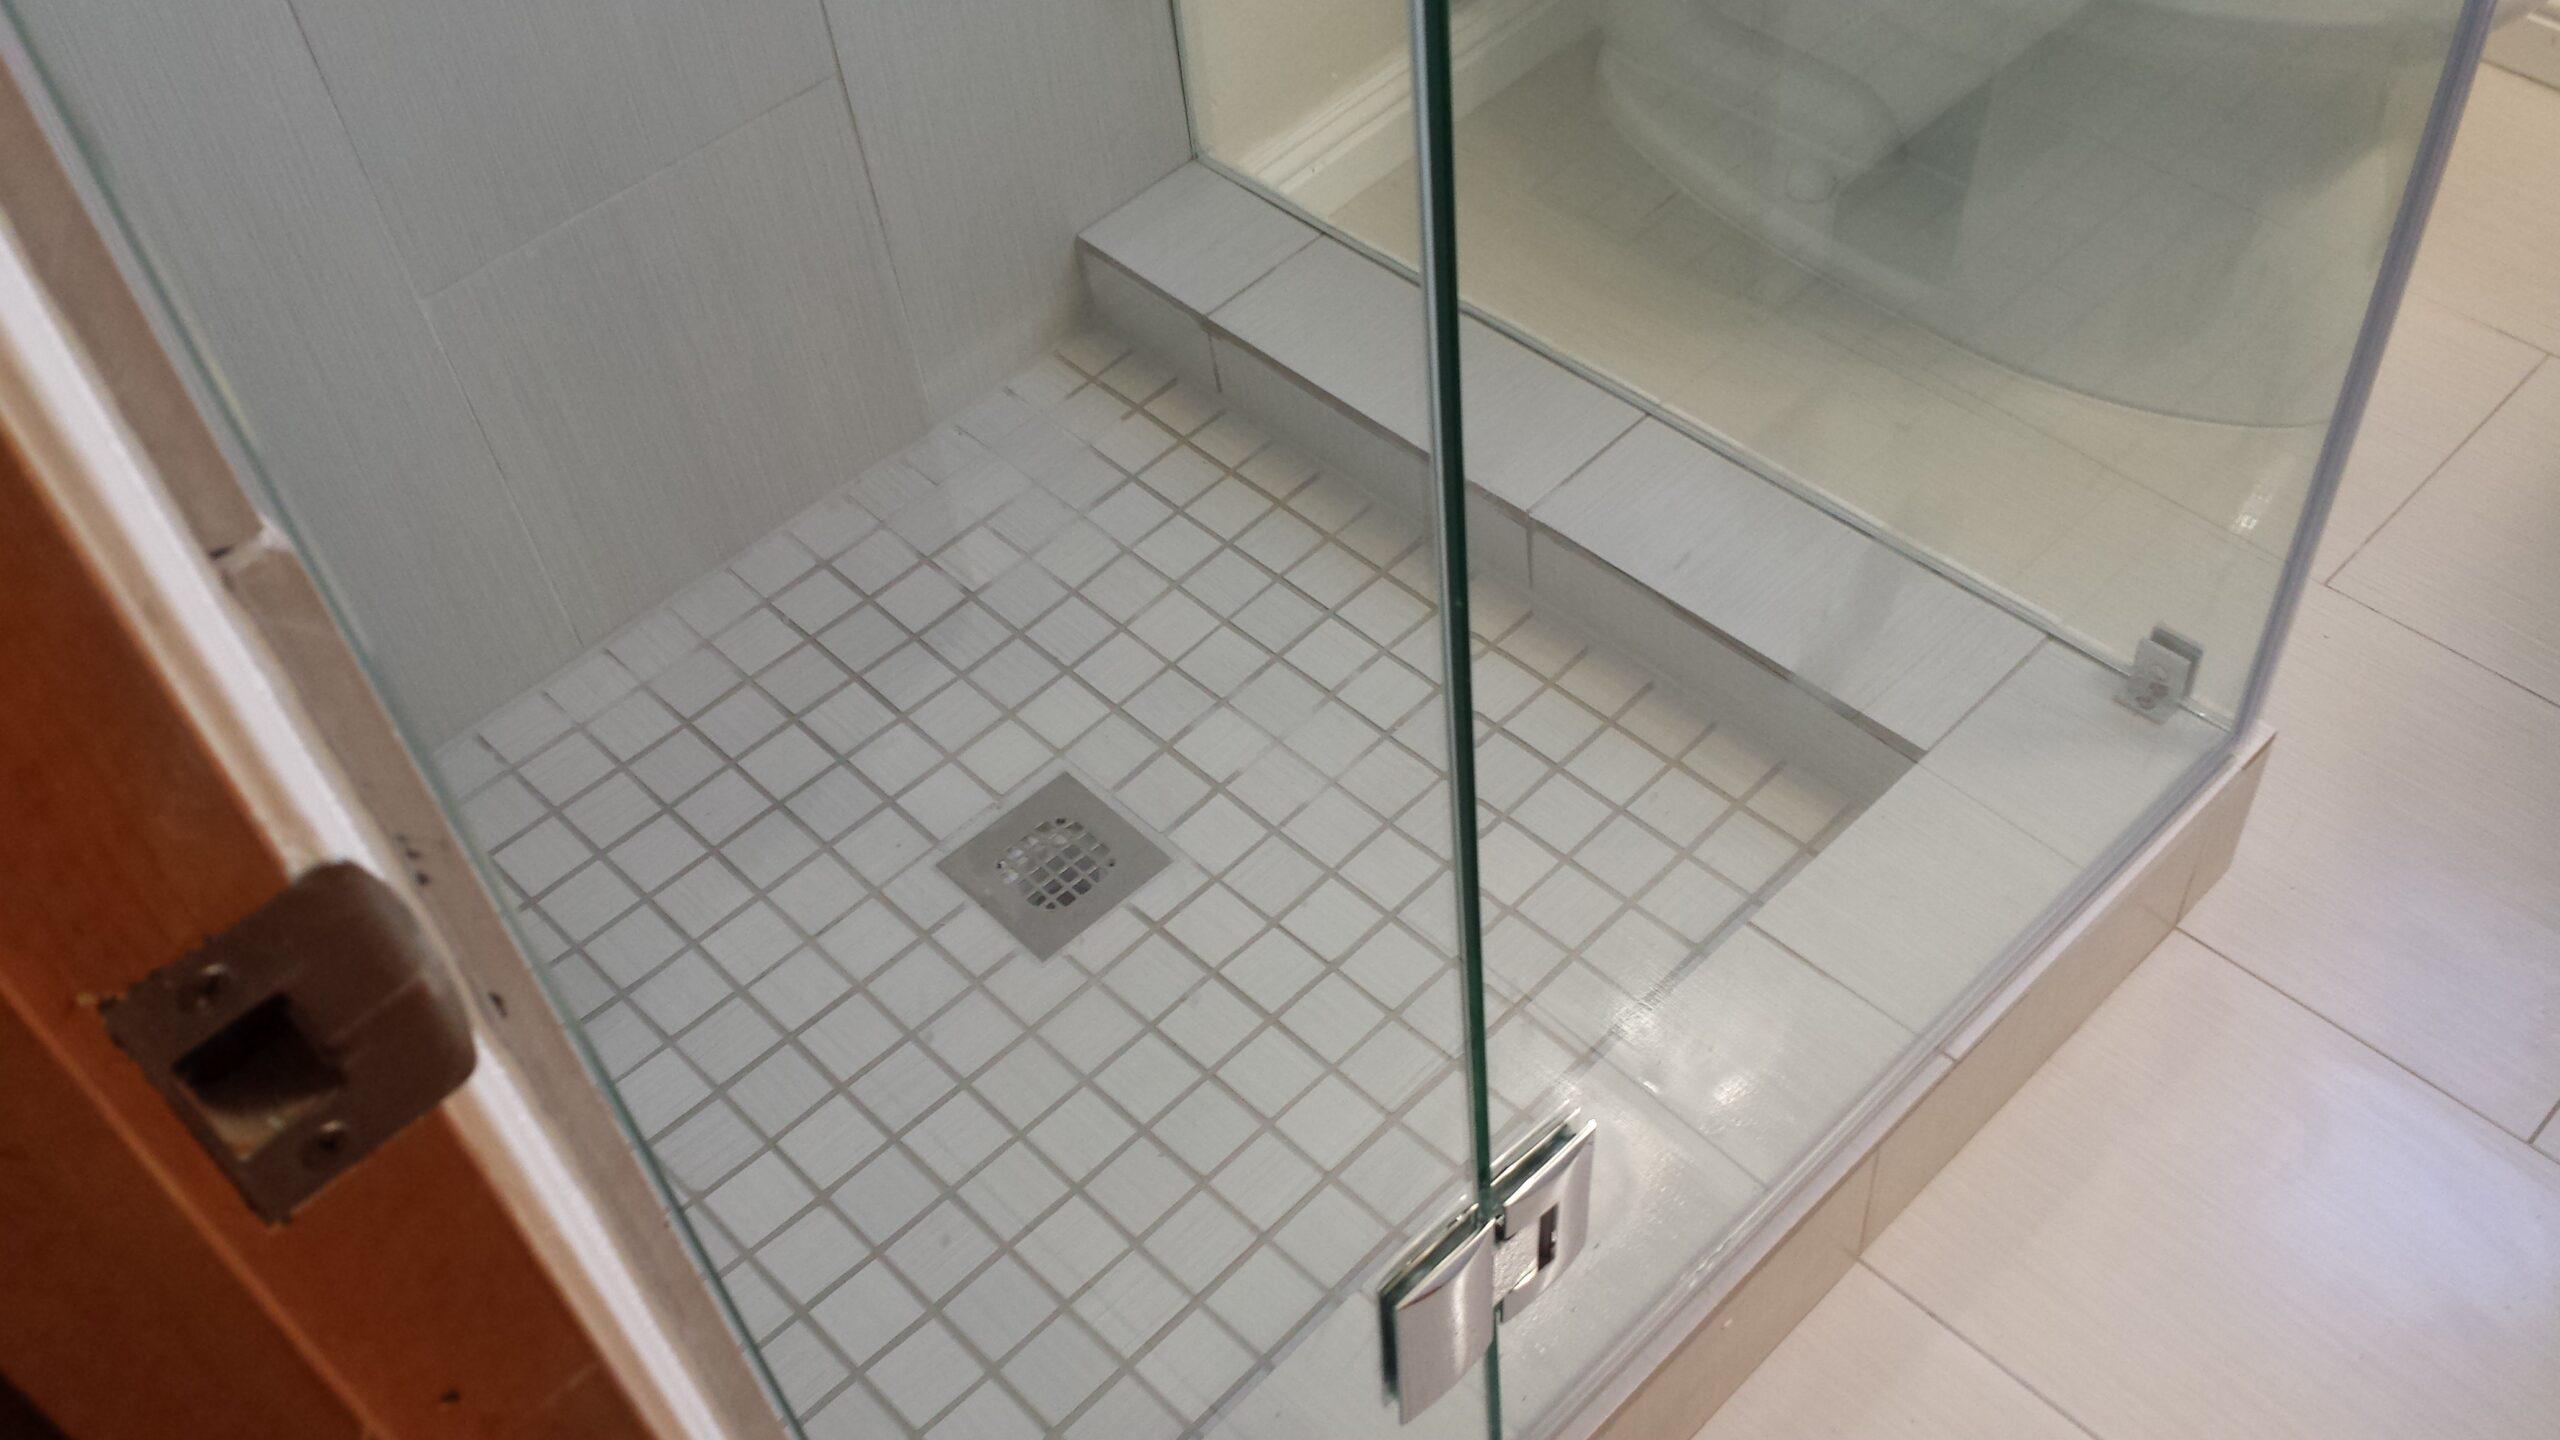 image showing bathroom remodel